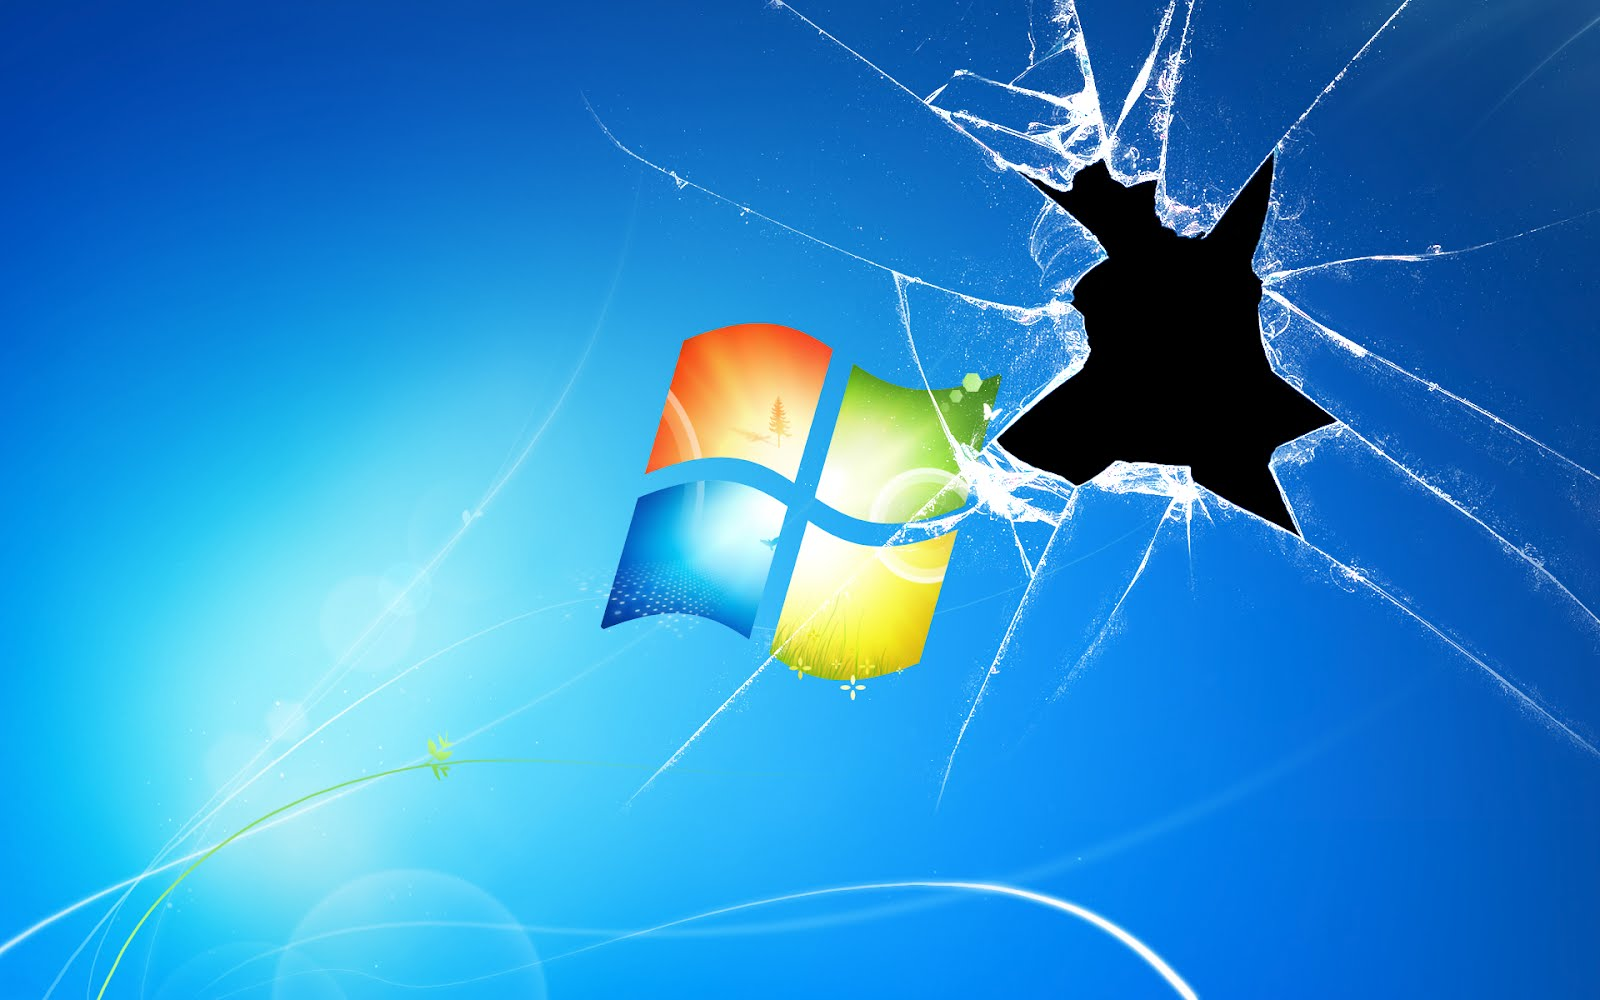 Windows 7 Wallpaper Free:Computer Wallpaper | Free ...